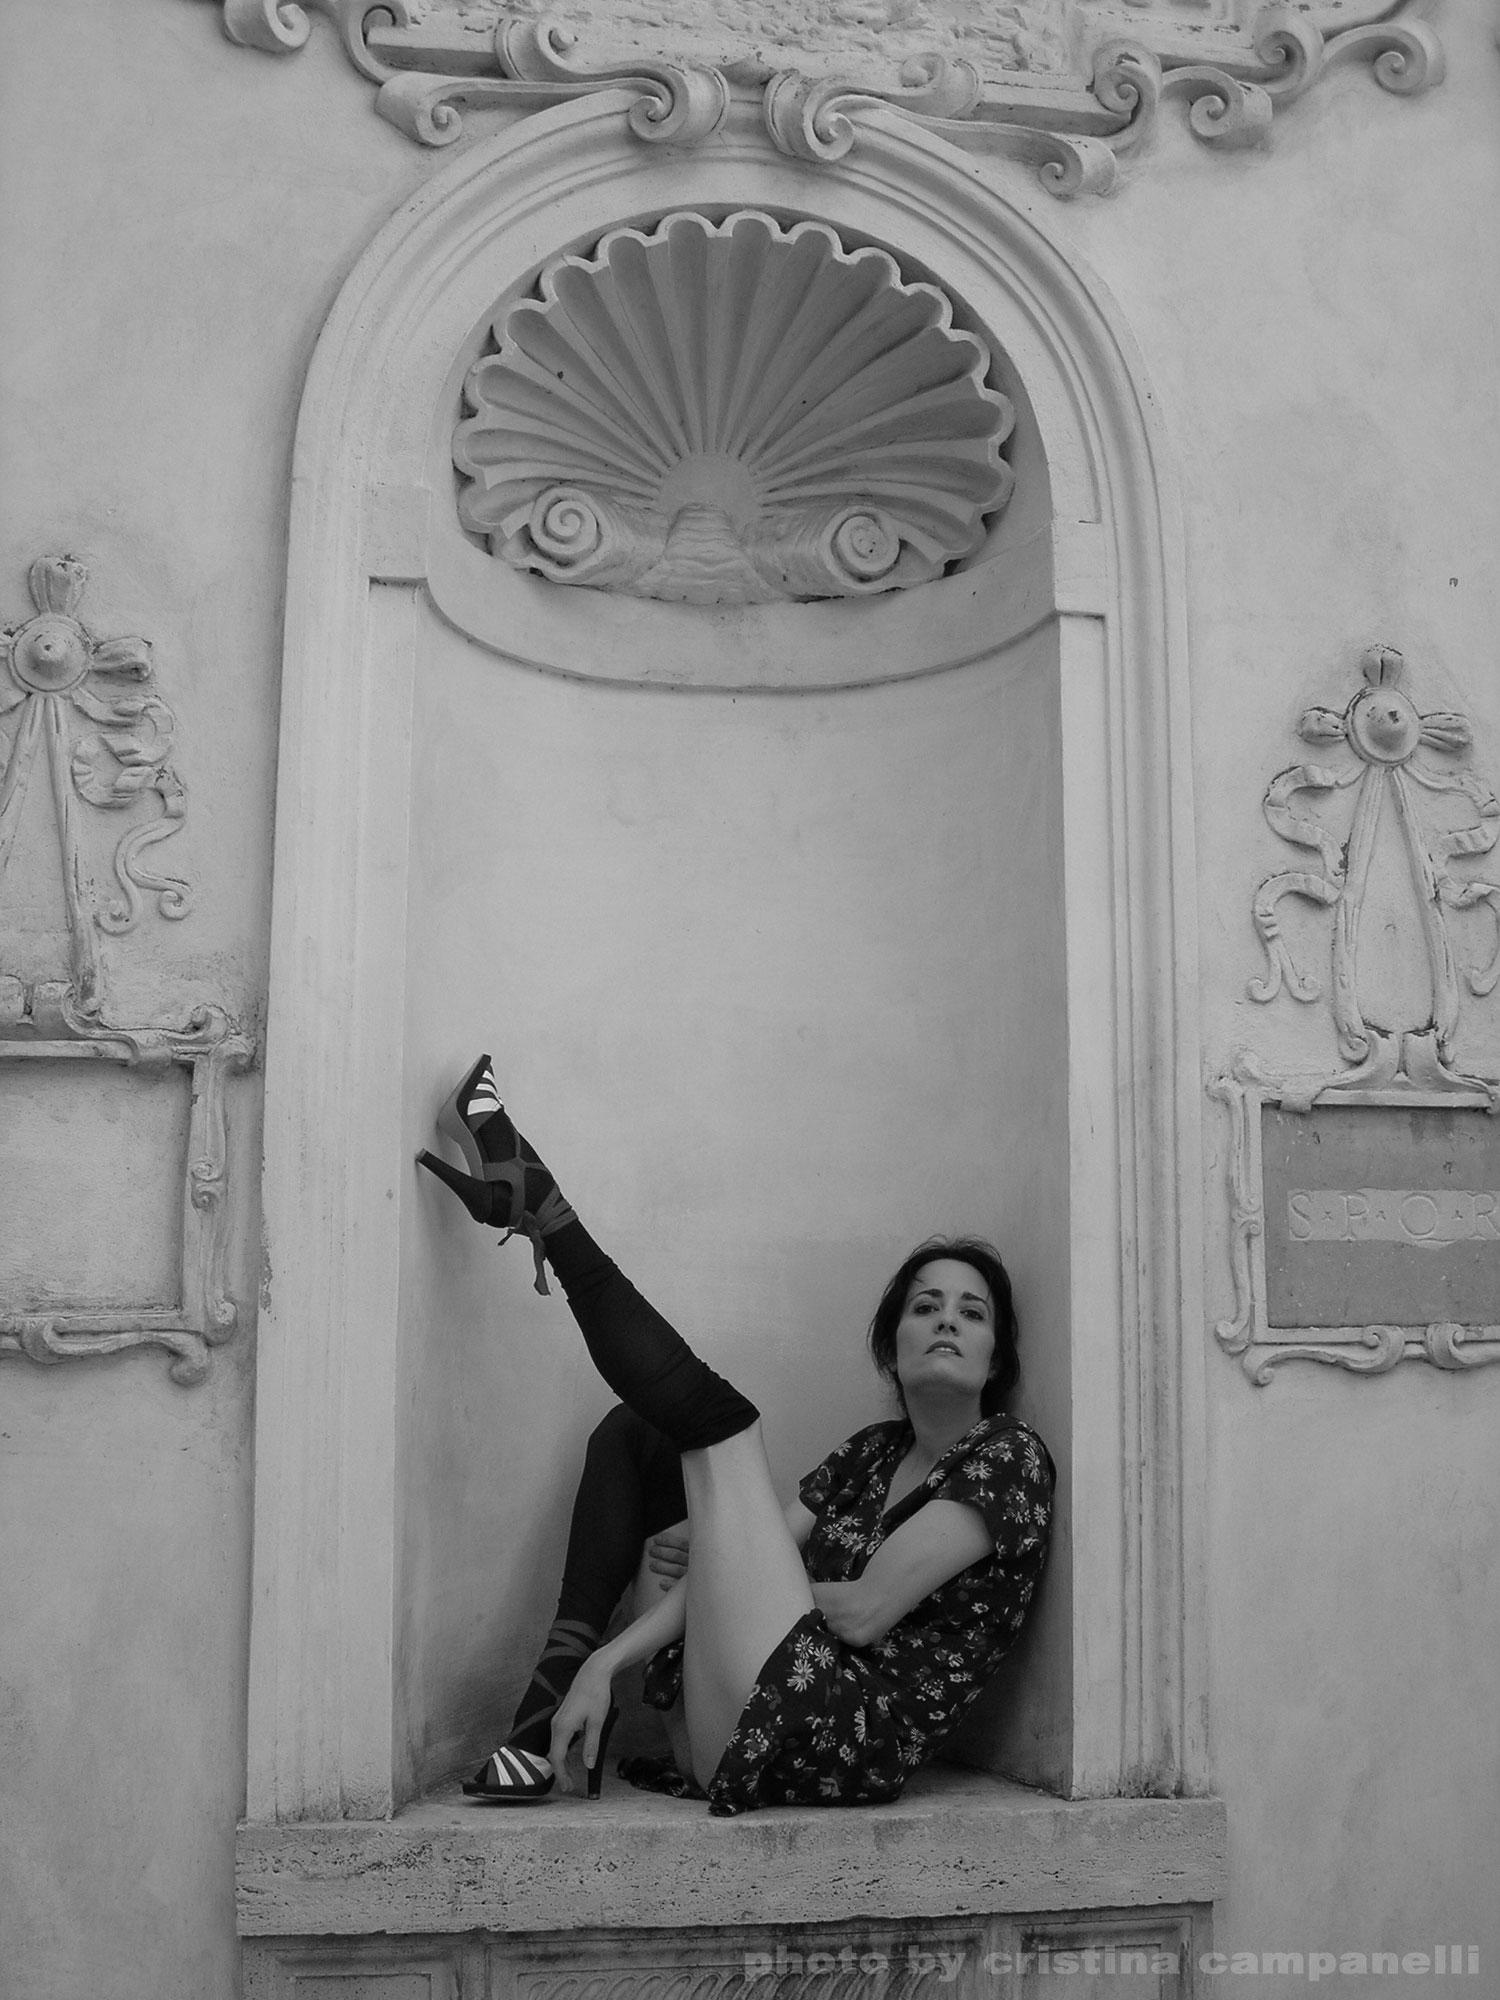 Coralina Cataldi-Tassoni photo by Cristina Campanelli (6).jpg